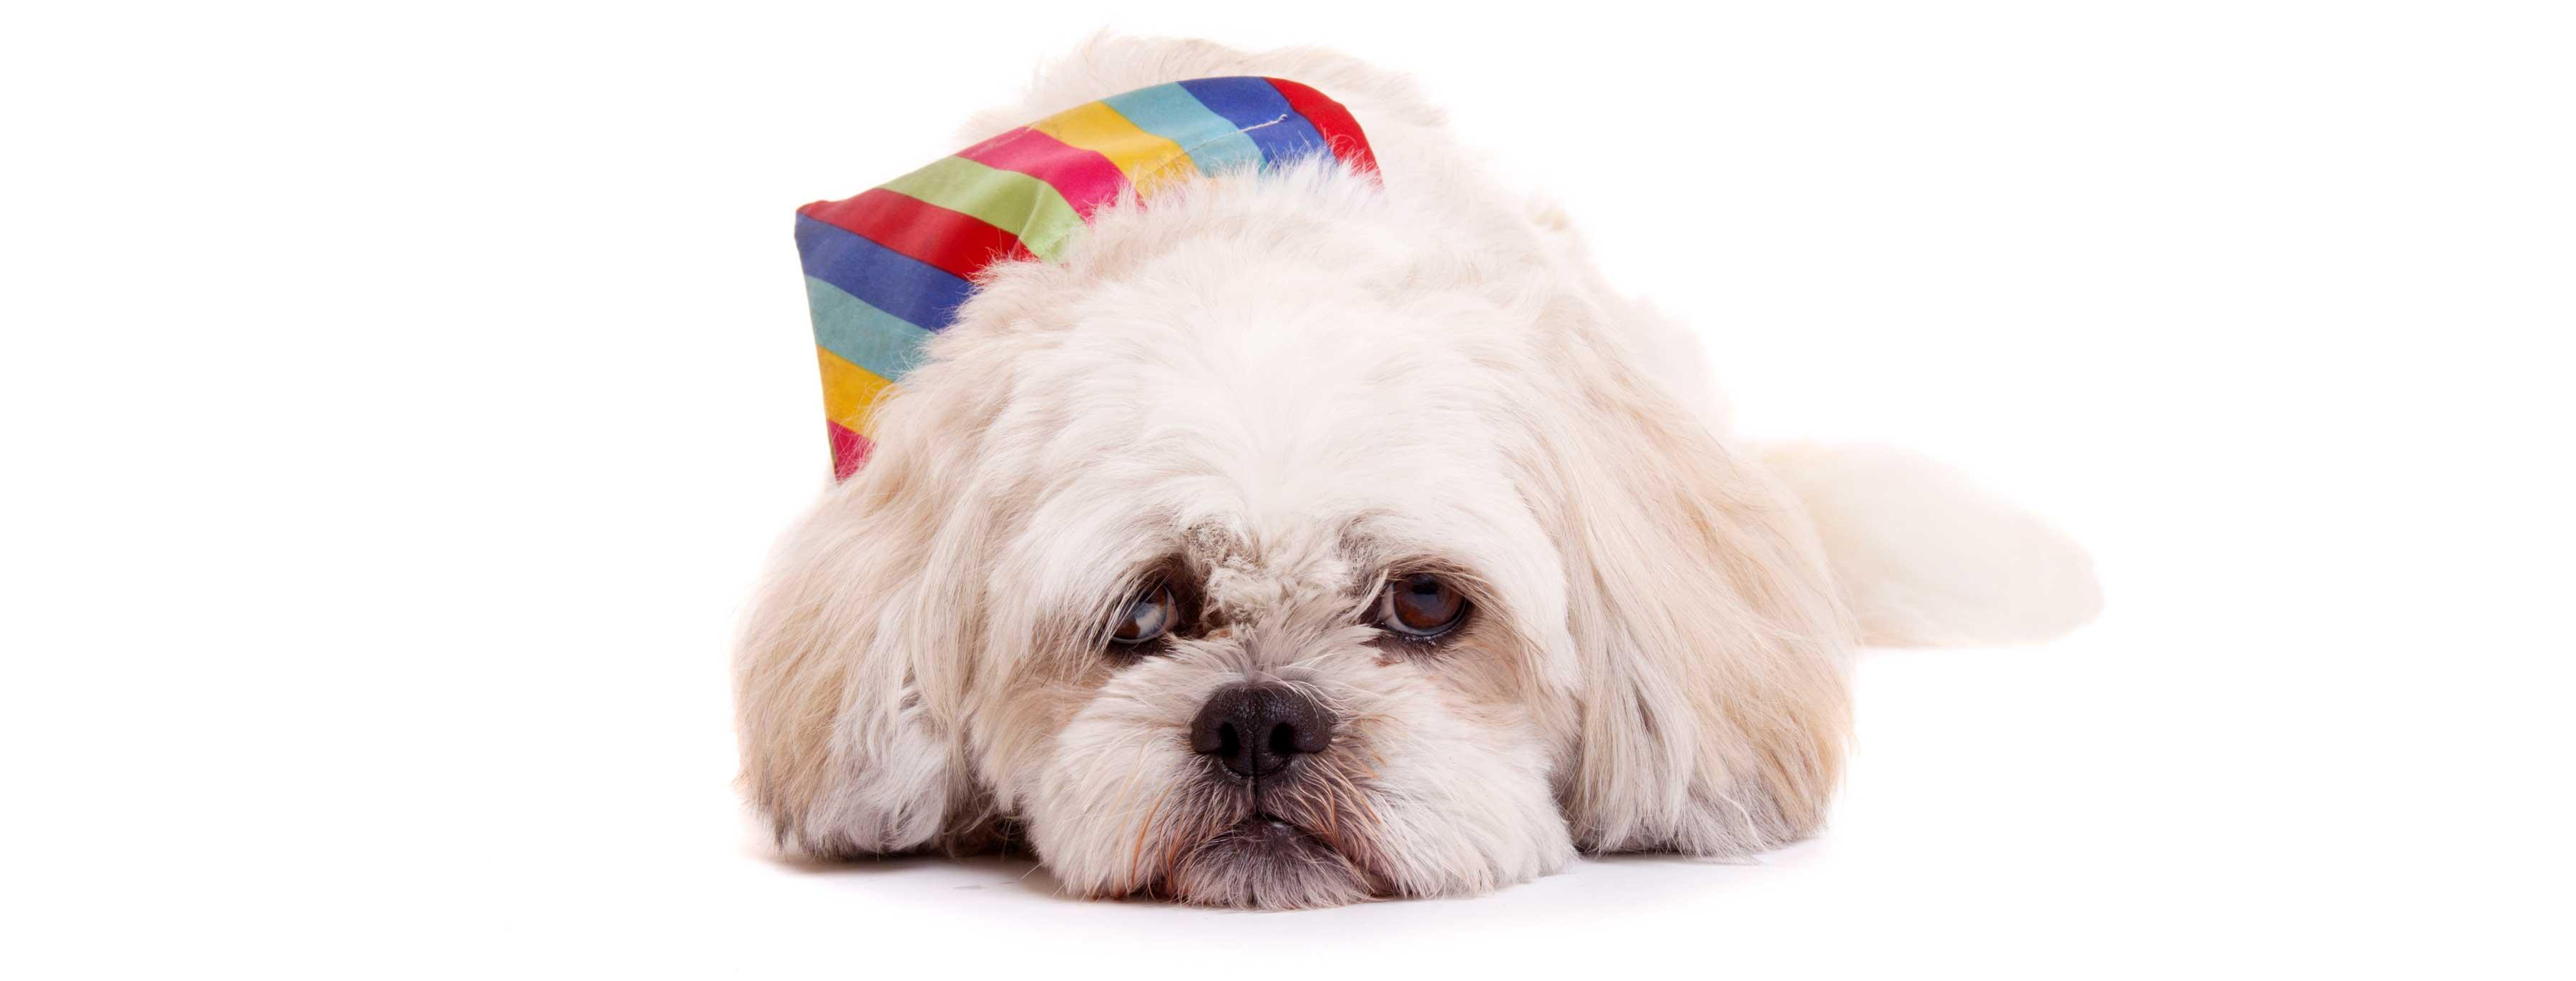 07-Pets-Dog-White-Colour-Collar-Philip-Murray-Photography-Dublin